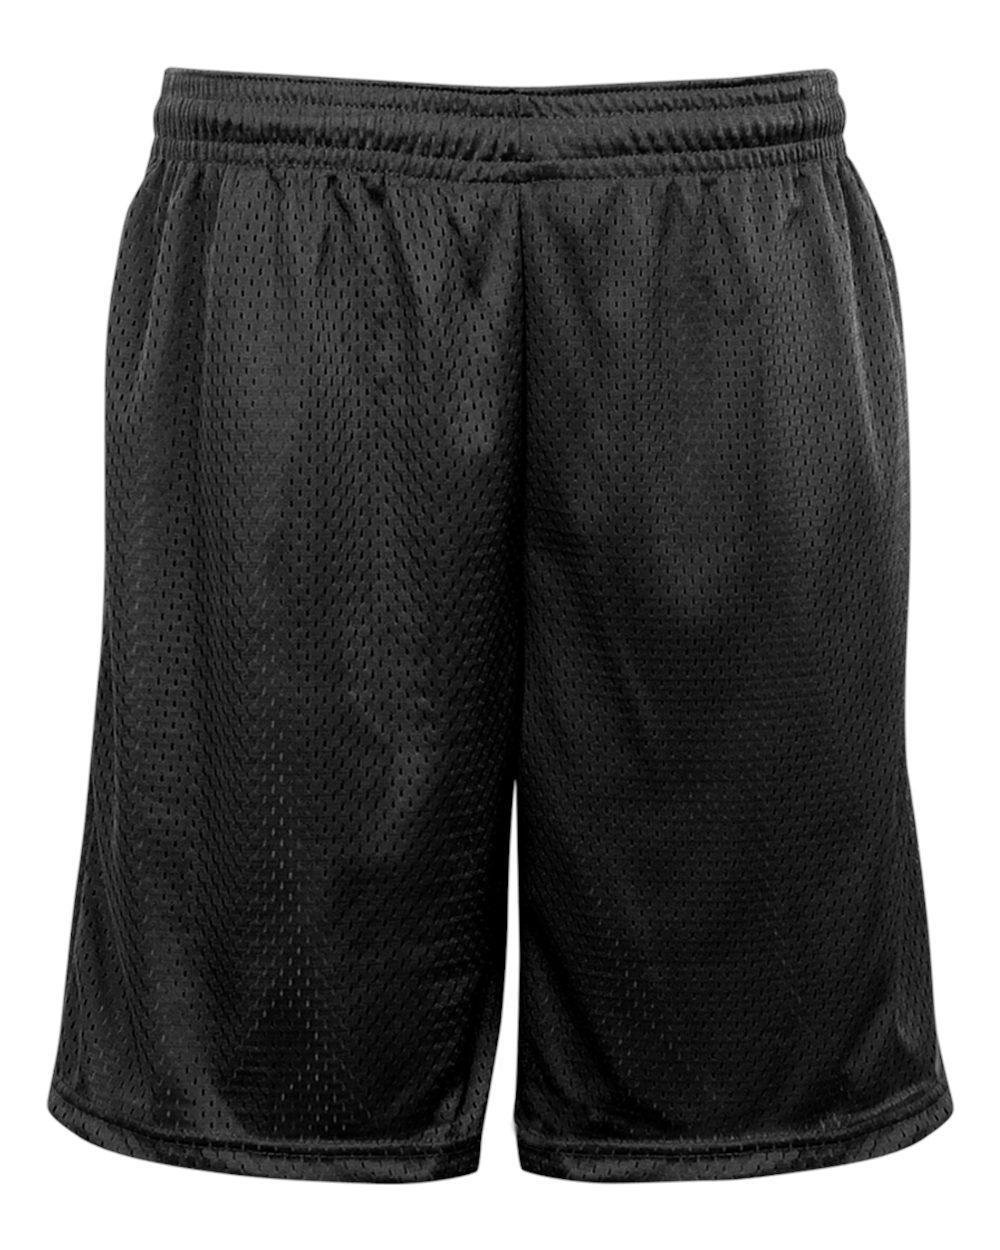 Mesh Pocketed Short - Black